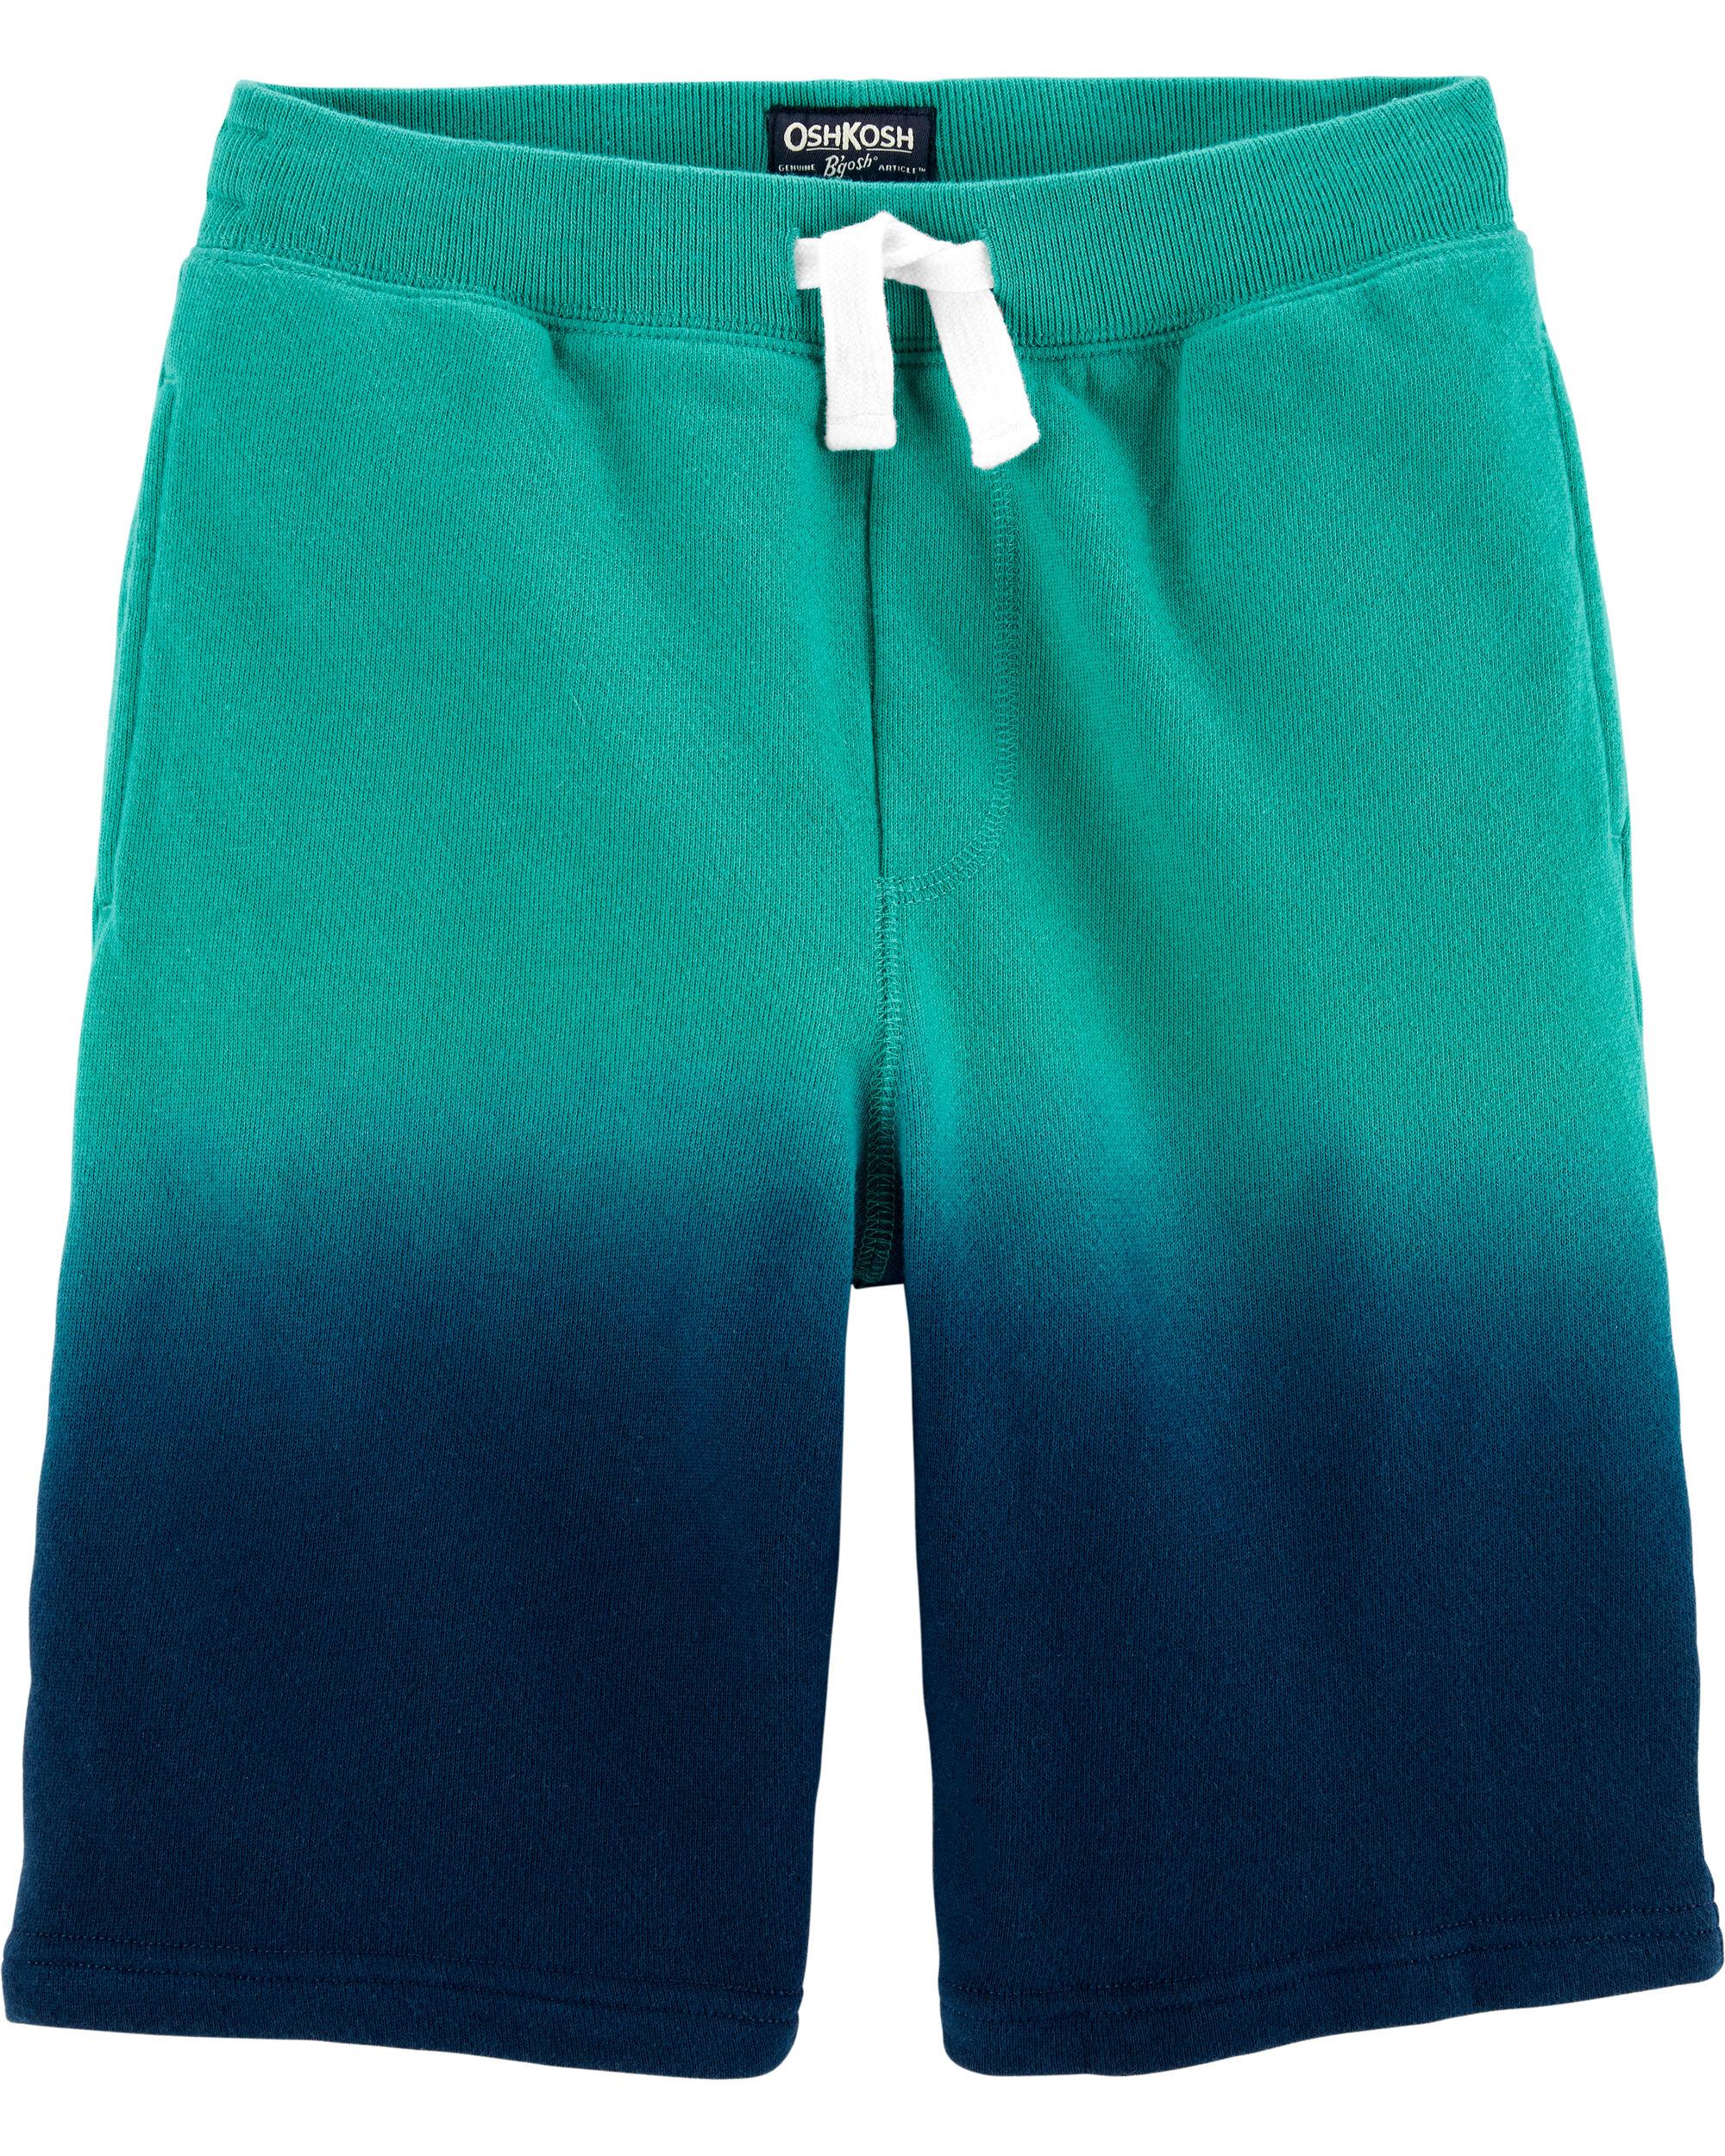 *DOORBUSTER* Dip-Dye Pull-On Shorts